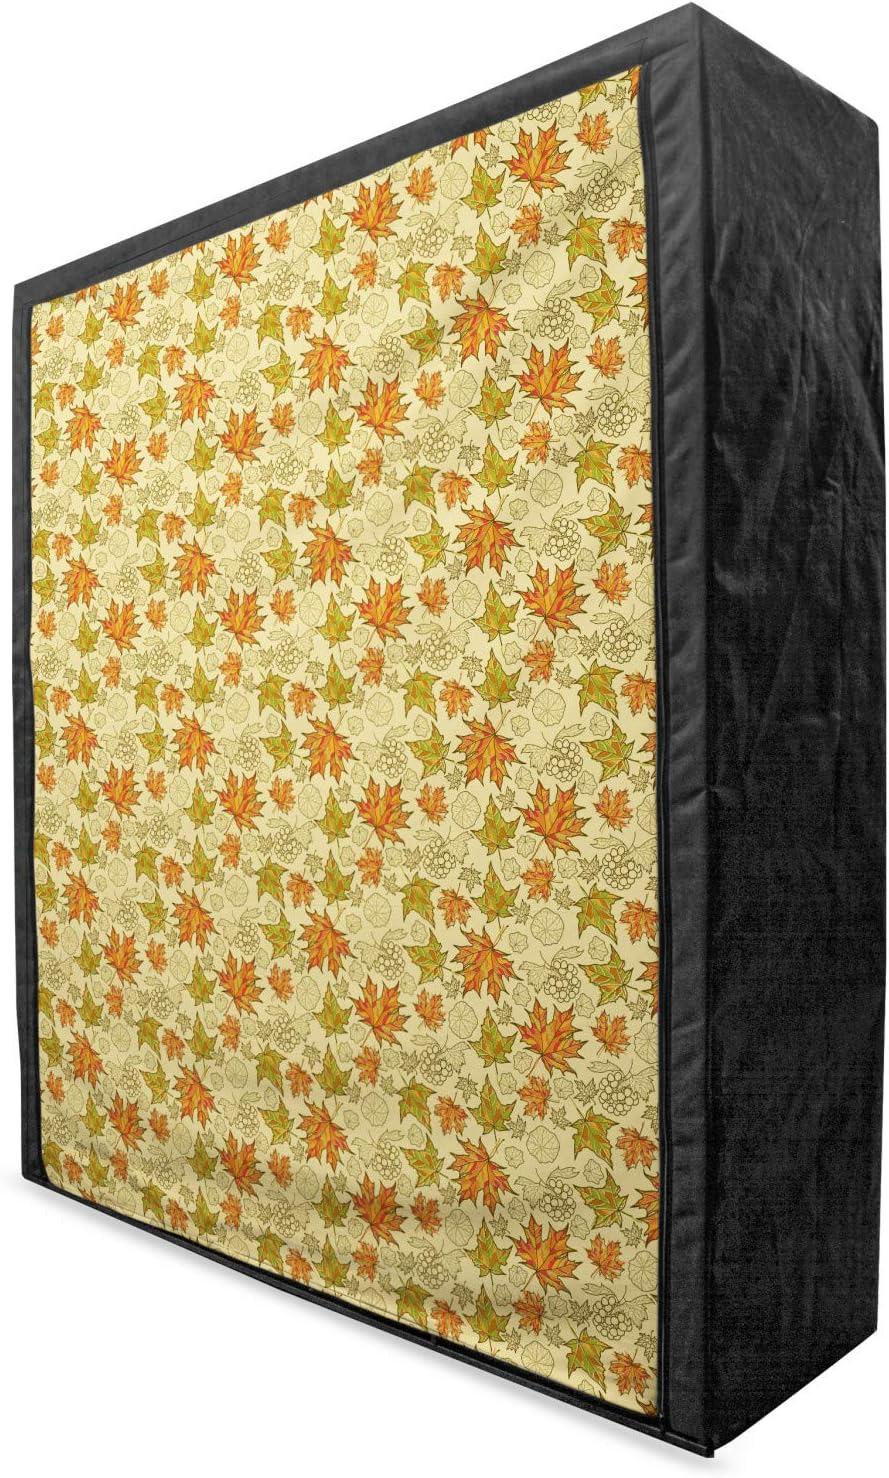 Lunarable Autumn Fall Portable Fabric Lea Boston Super beauty product restock quality top! Mall Grunge Maple Wardrobe